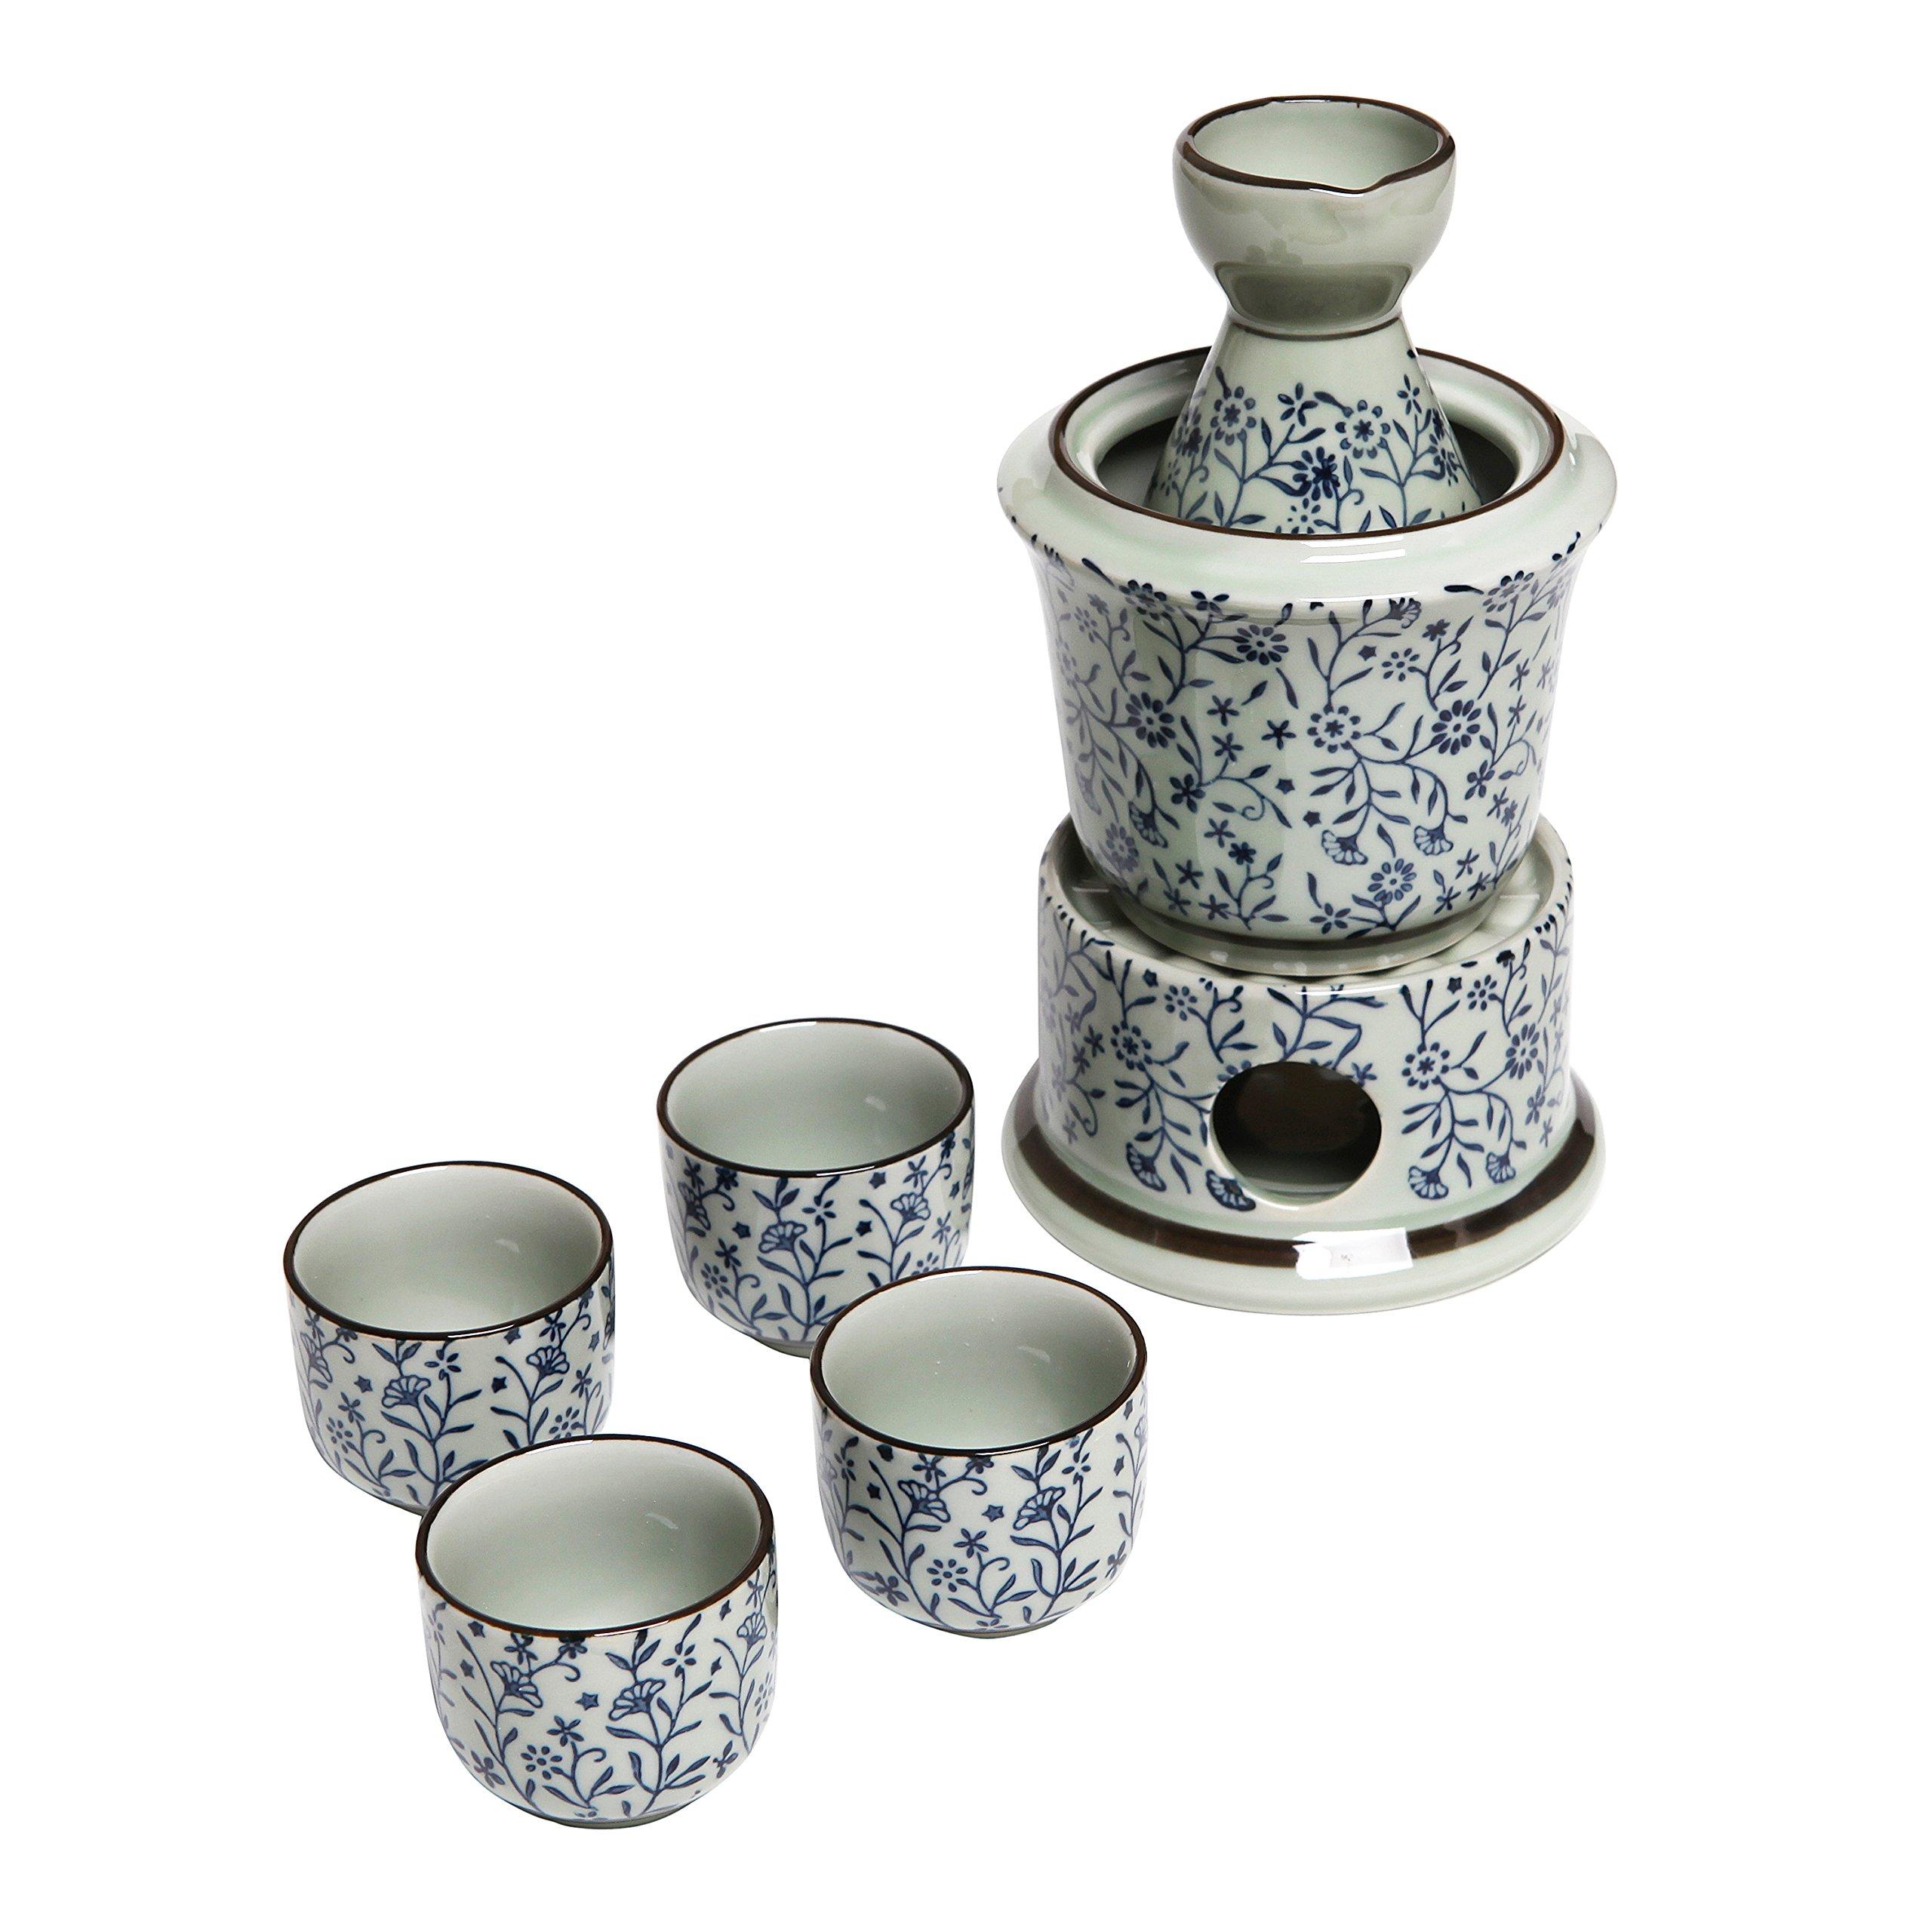 Exquisite Ceramic Blue Flowers Japanese Sake Set w/ 4 Shot Glass/Cups, Serving Carafe & Warmer Bowl by MyGift (Image #2)